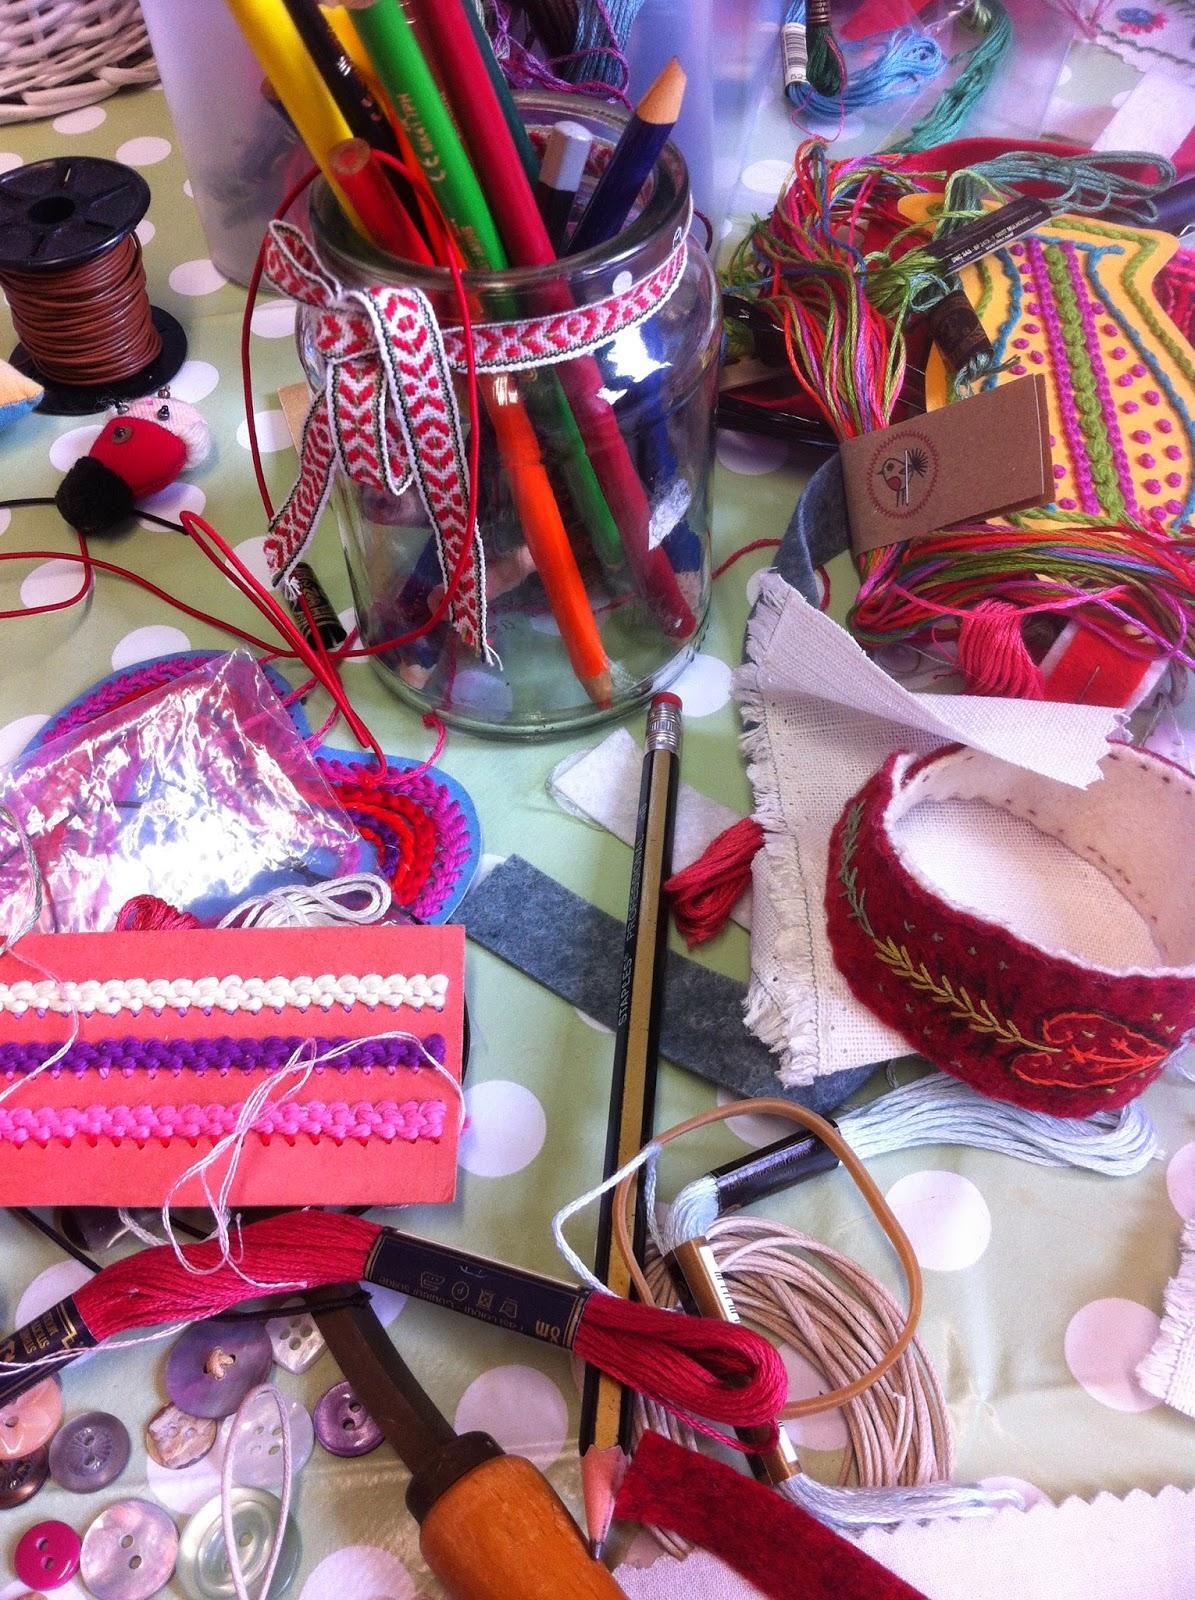 Emboidery class, felt bracelets